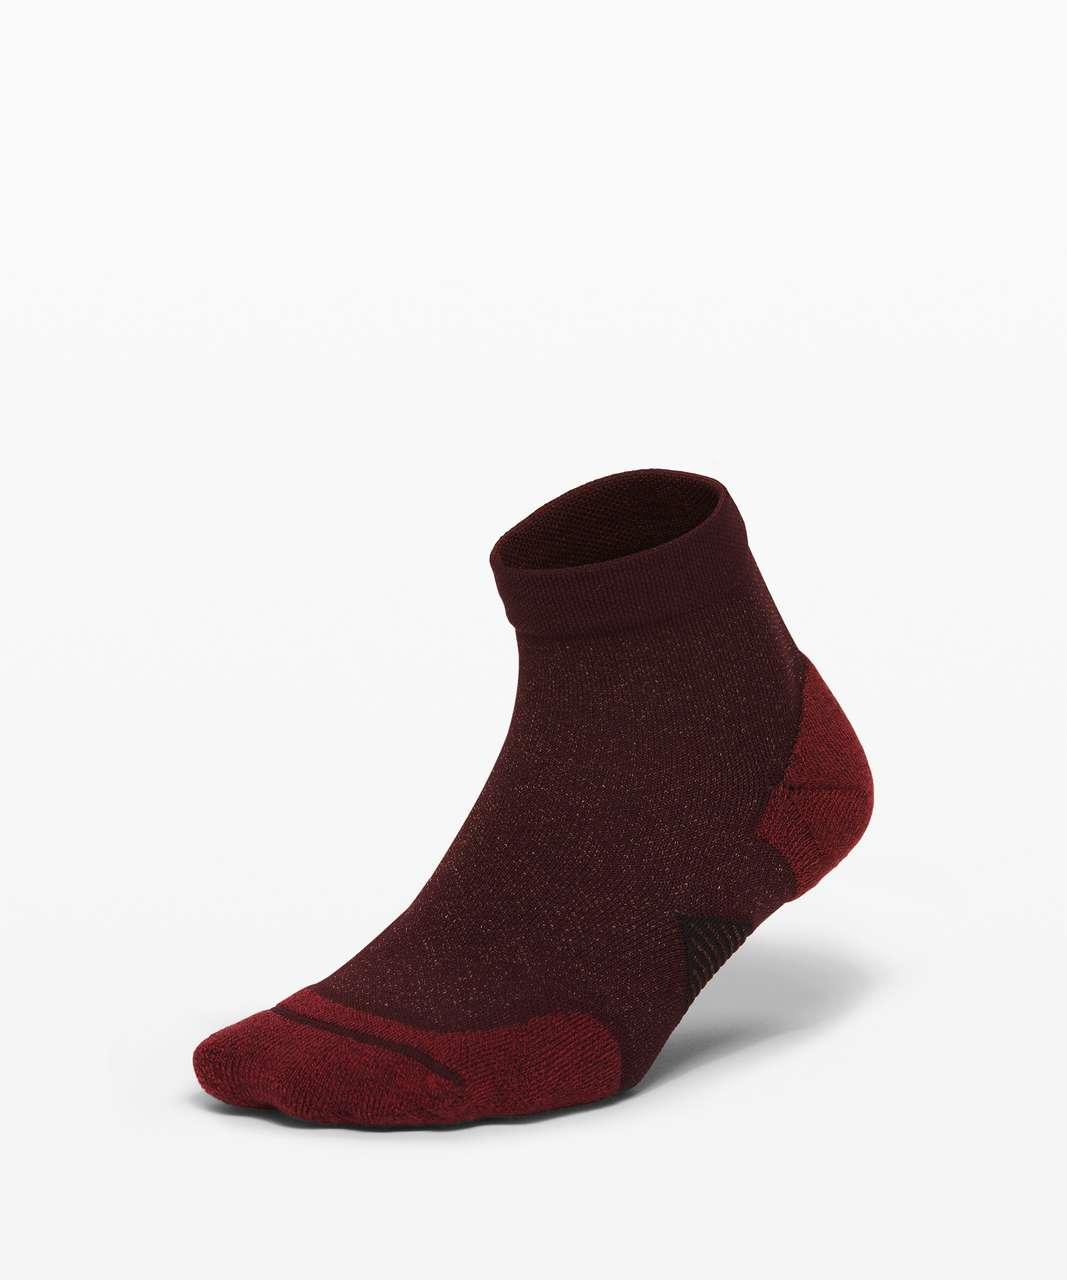 Lululemon Speed Ankle Sock *Silver - Cassis / Chianti